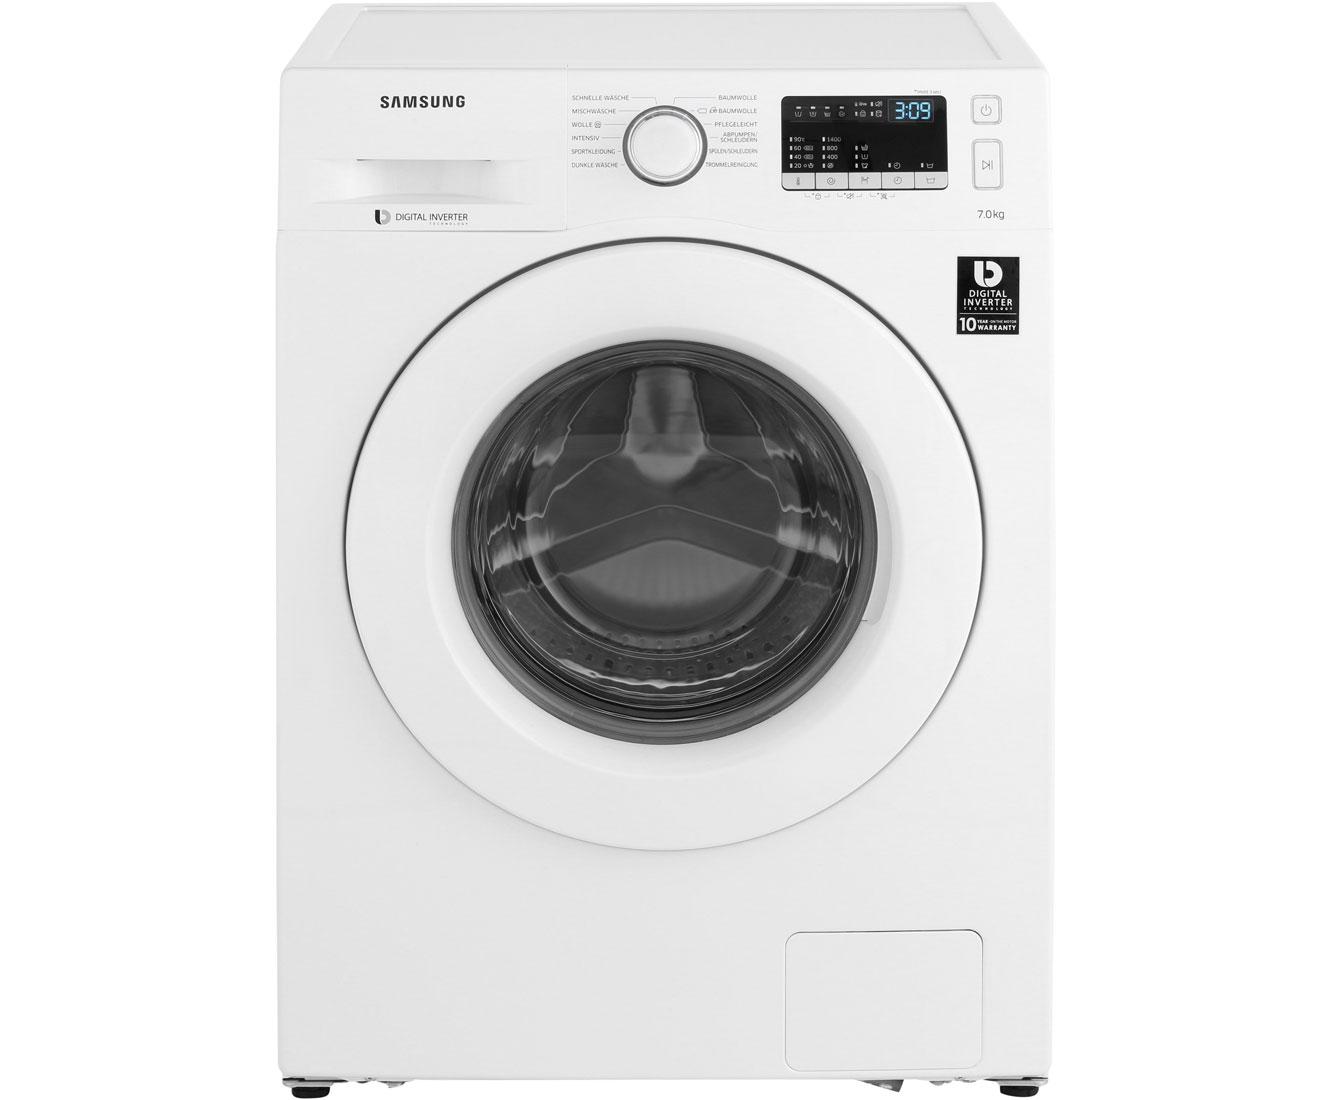 Samsung WW70J44A3MWEG Waschmaschine Weiß, 7 kg, 1400 UMin, A+++